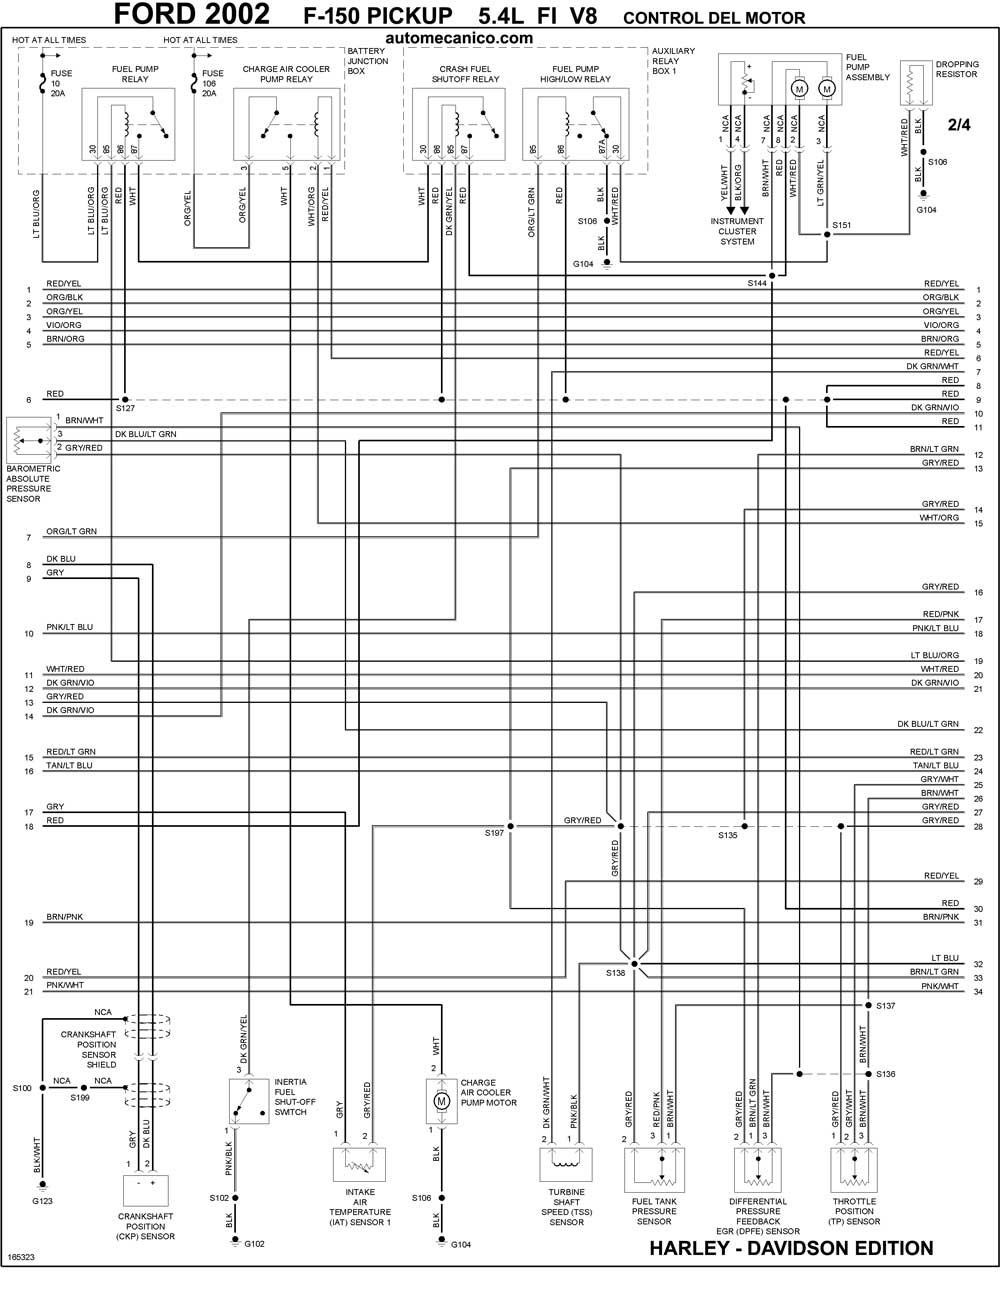 harley davidson Diagrama del motor